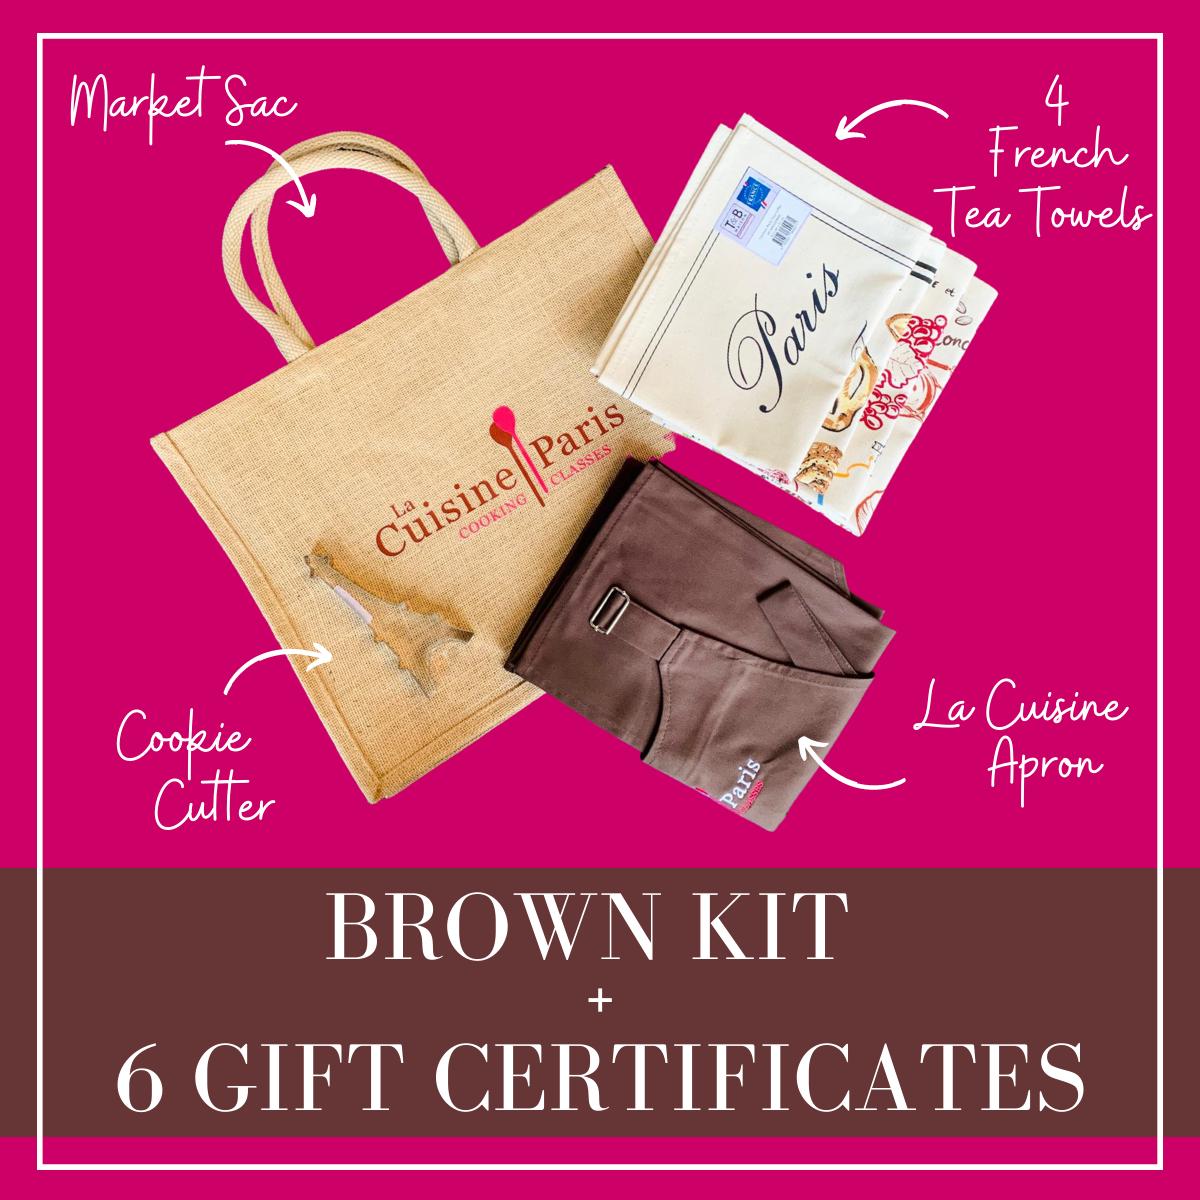 Brown La Cuisine Paris Kit + 6  Video Gift Certificate